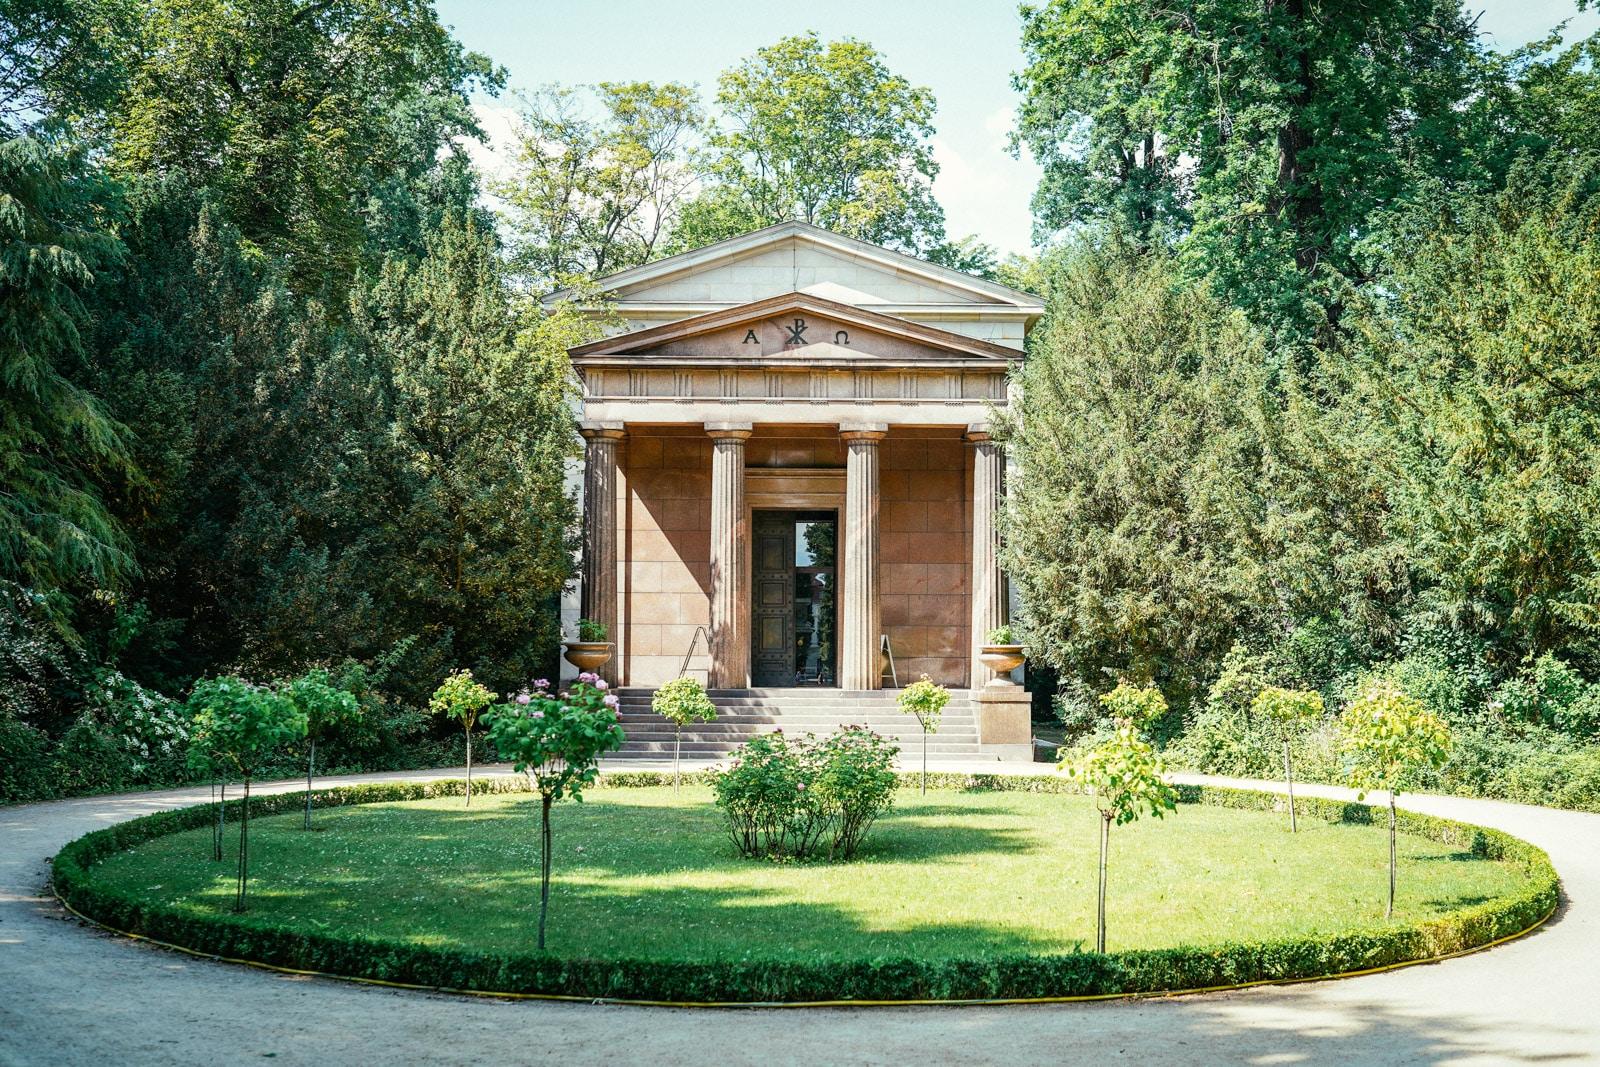 The Mausoleum at Schloss Charlottenburg